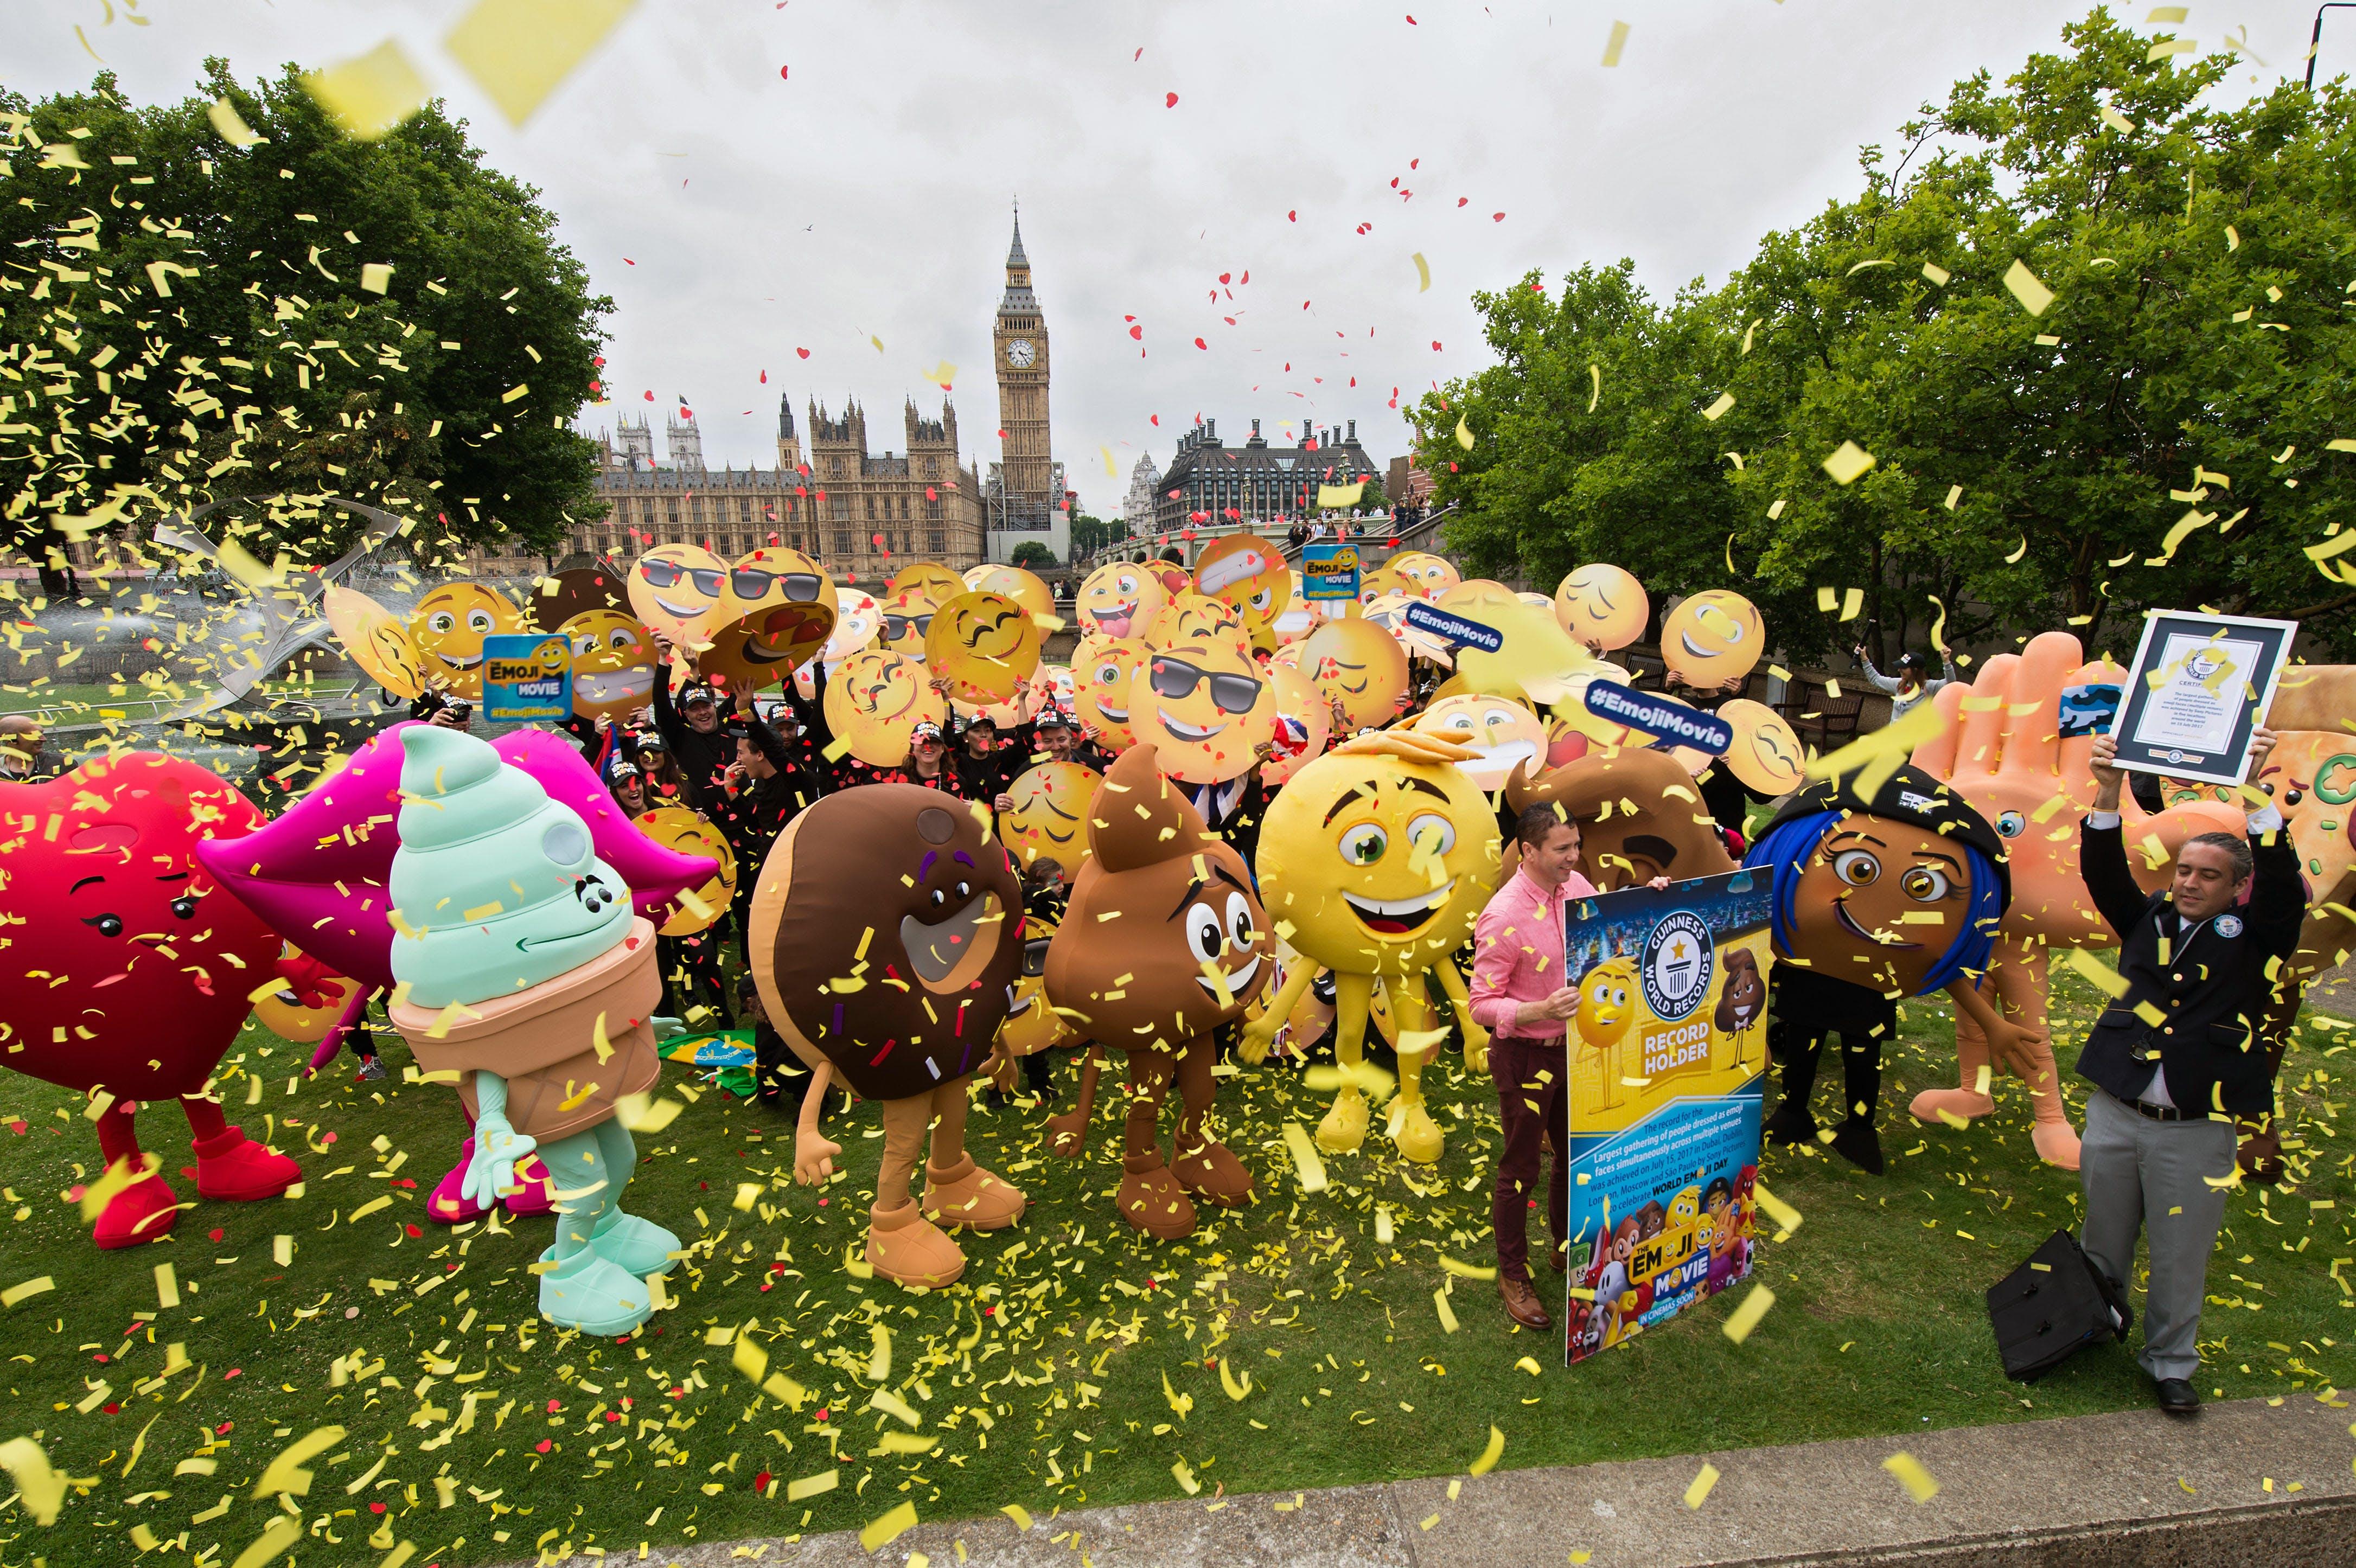 Guinness World Record international emoji gathering